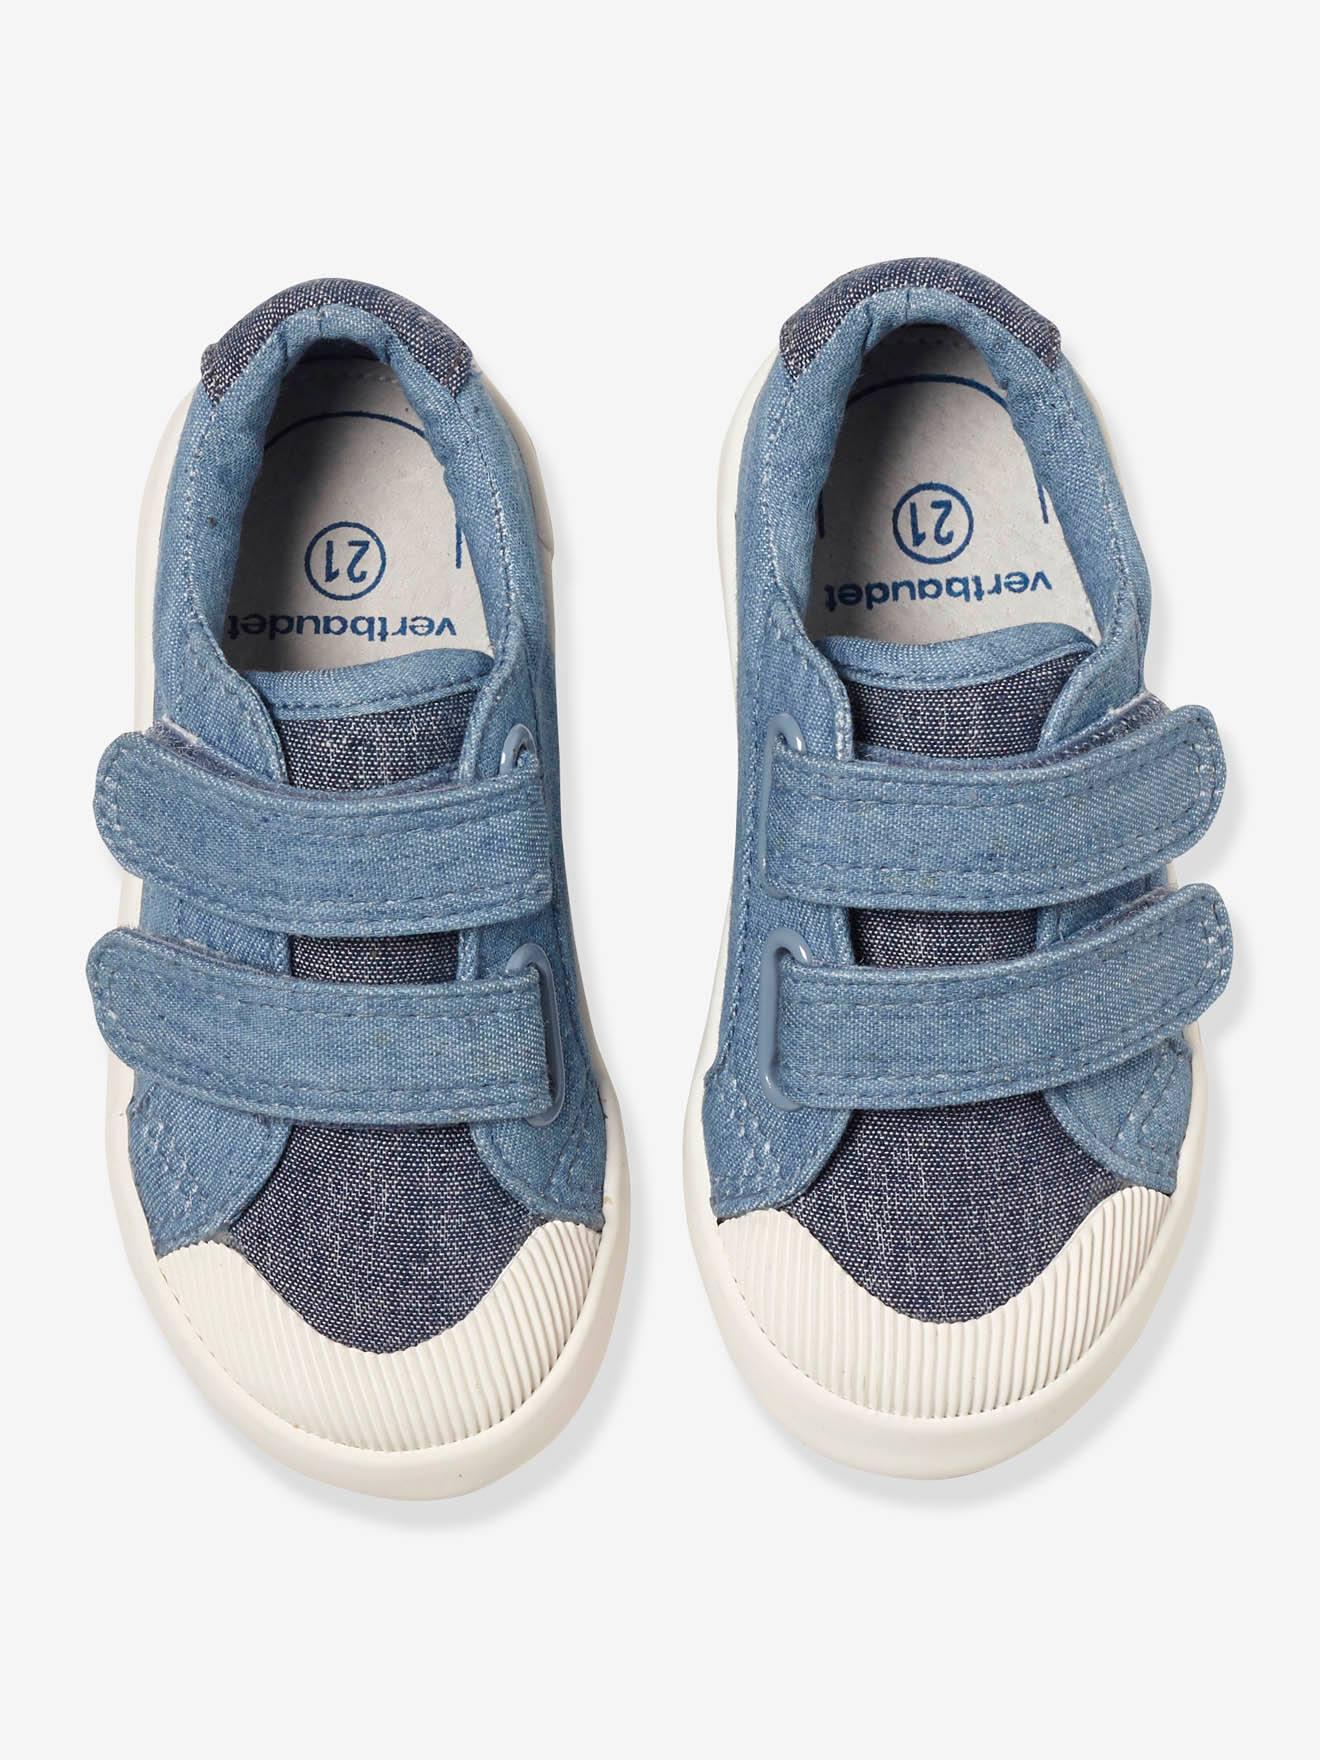 ad85e6ce4 Zapatillas deportivas de lona con tiras autoadherentes bebé niño rojo medio  liso con motivos - Vertbaudet